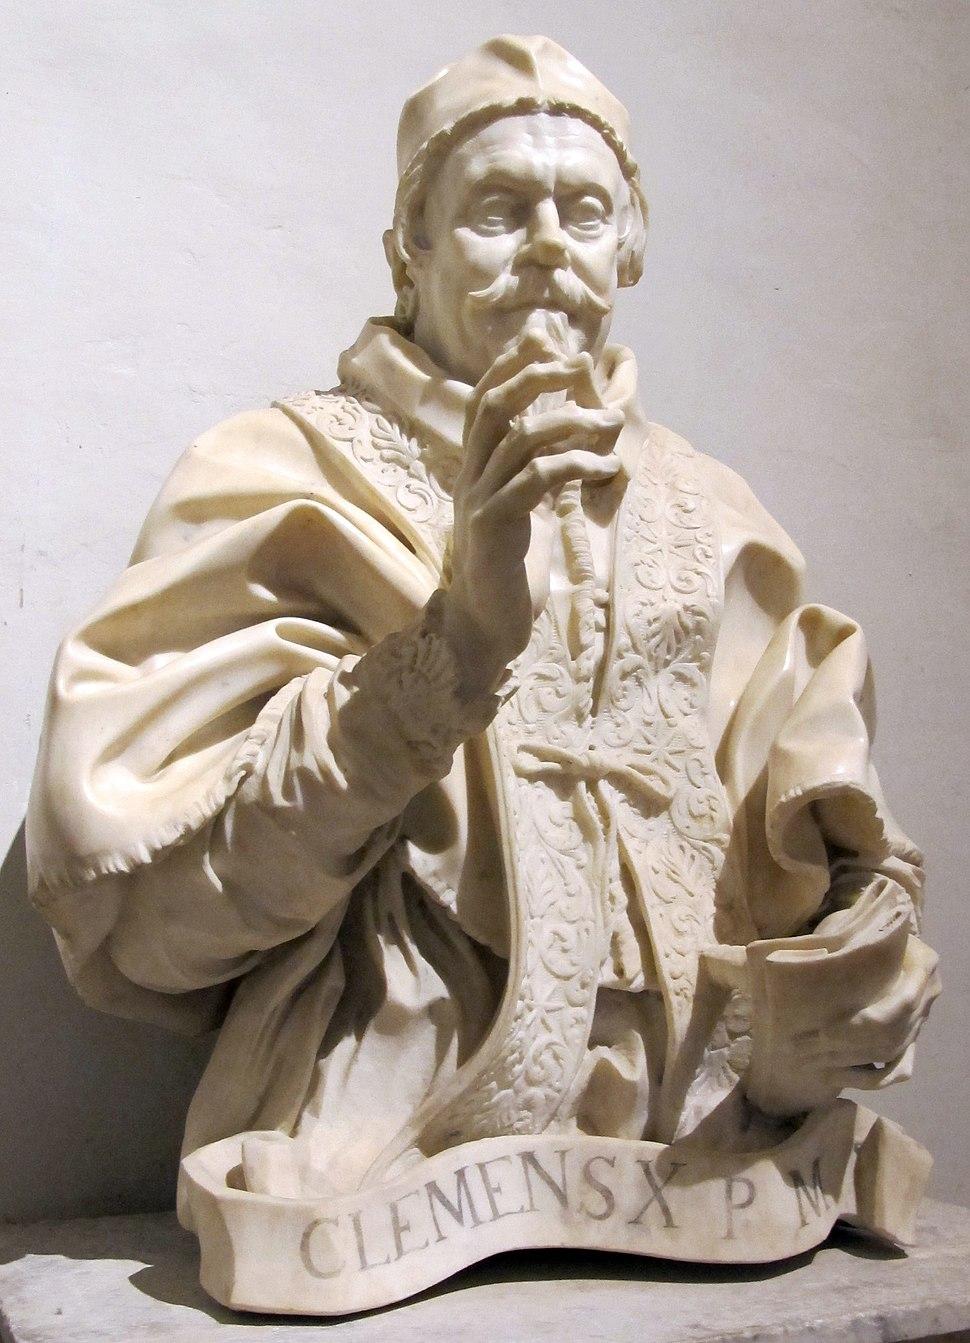 Gianlorenzo bernini, busto di Clemente X 02